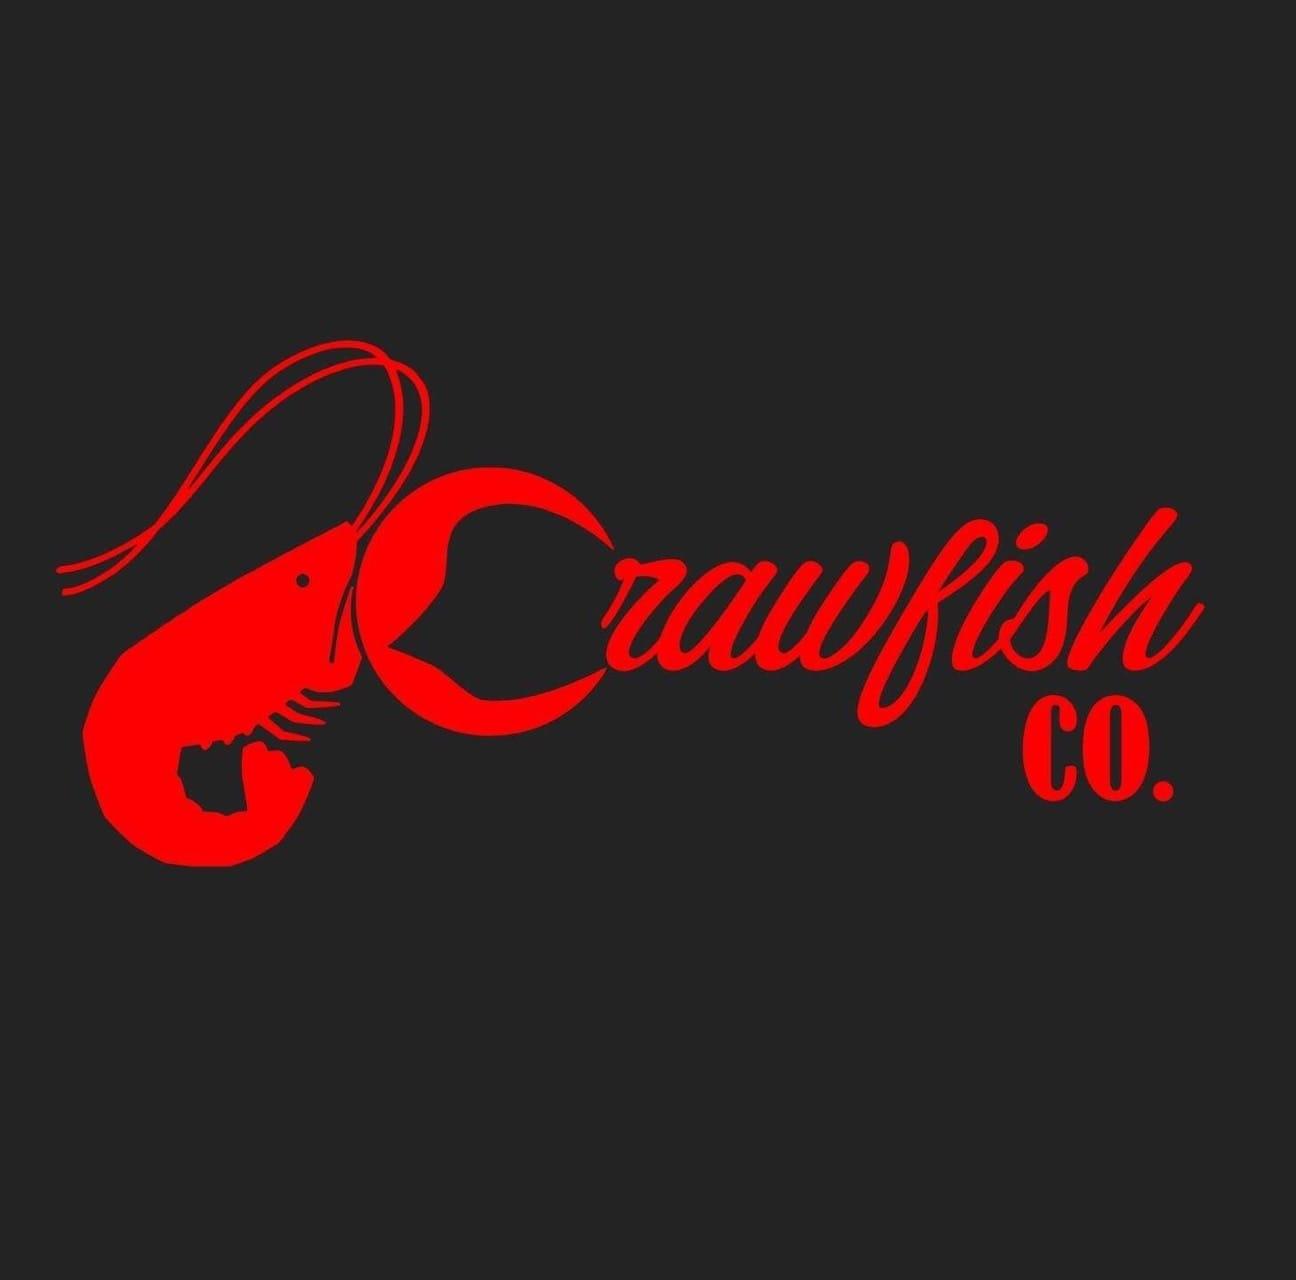 Crawfish Co.